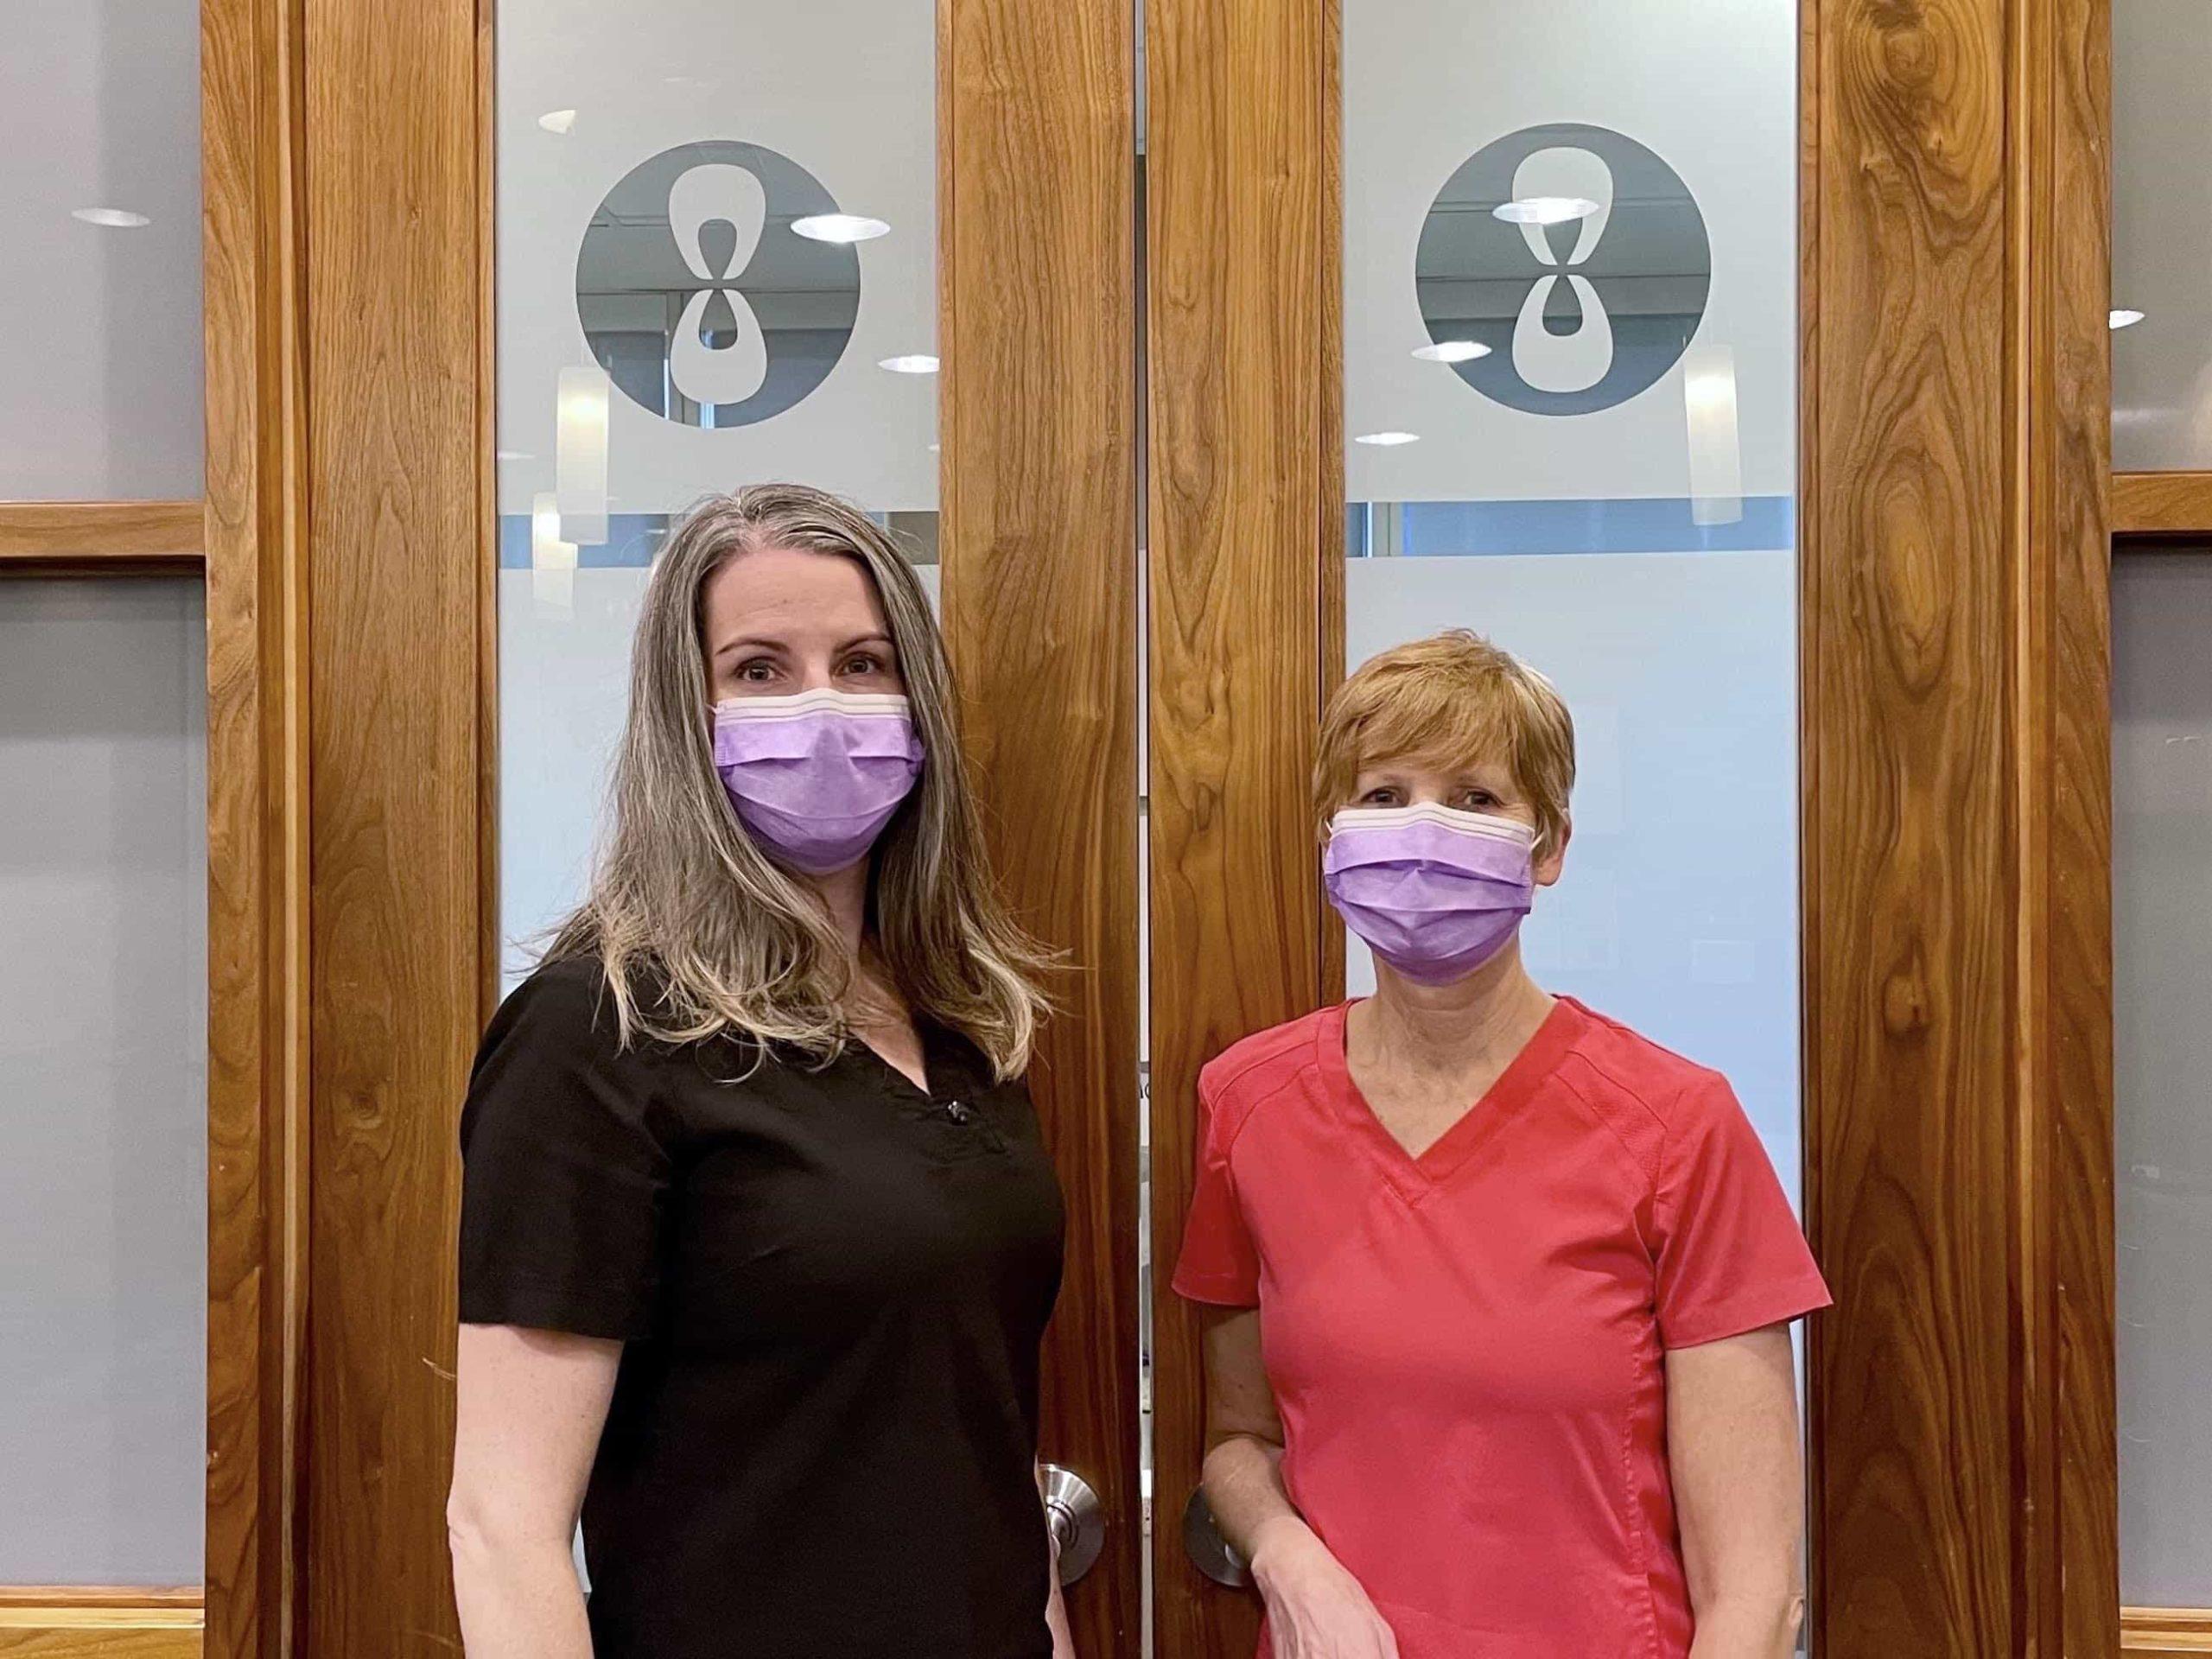 8 West Dental Care Staff